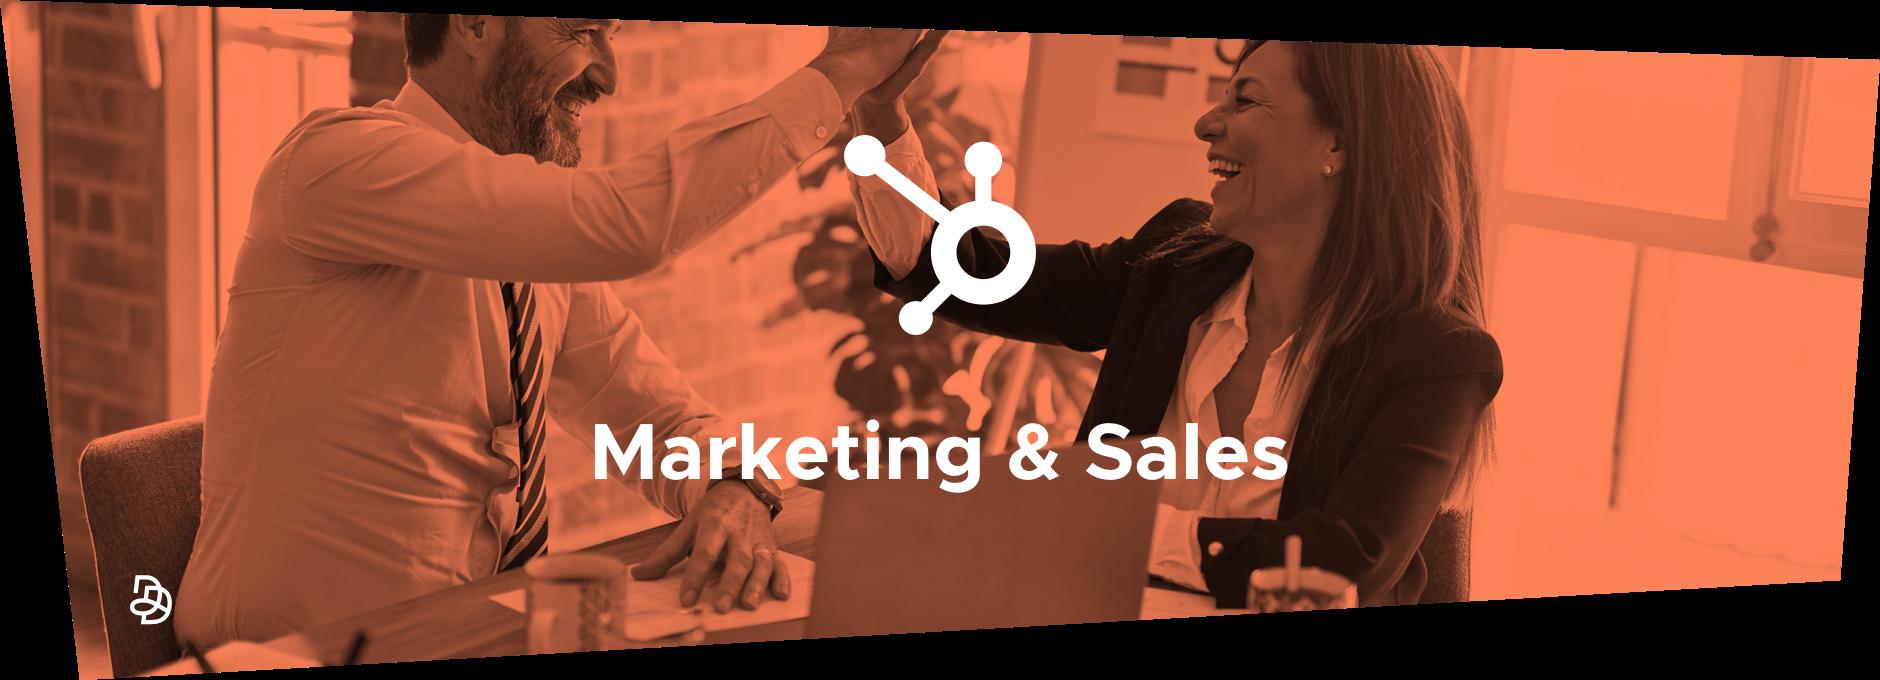 Marketing, Sales, HubSpot